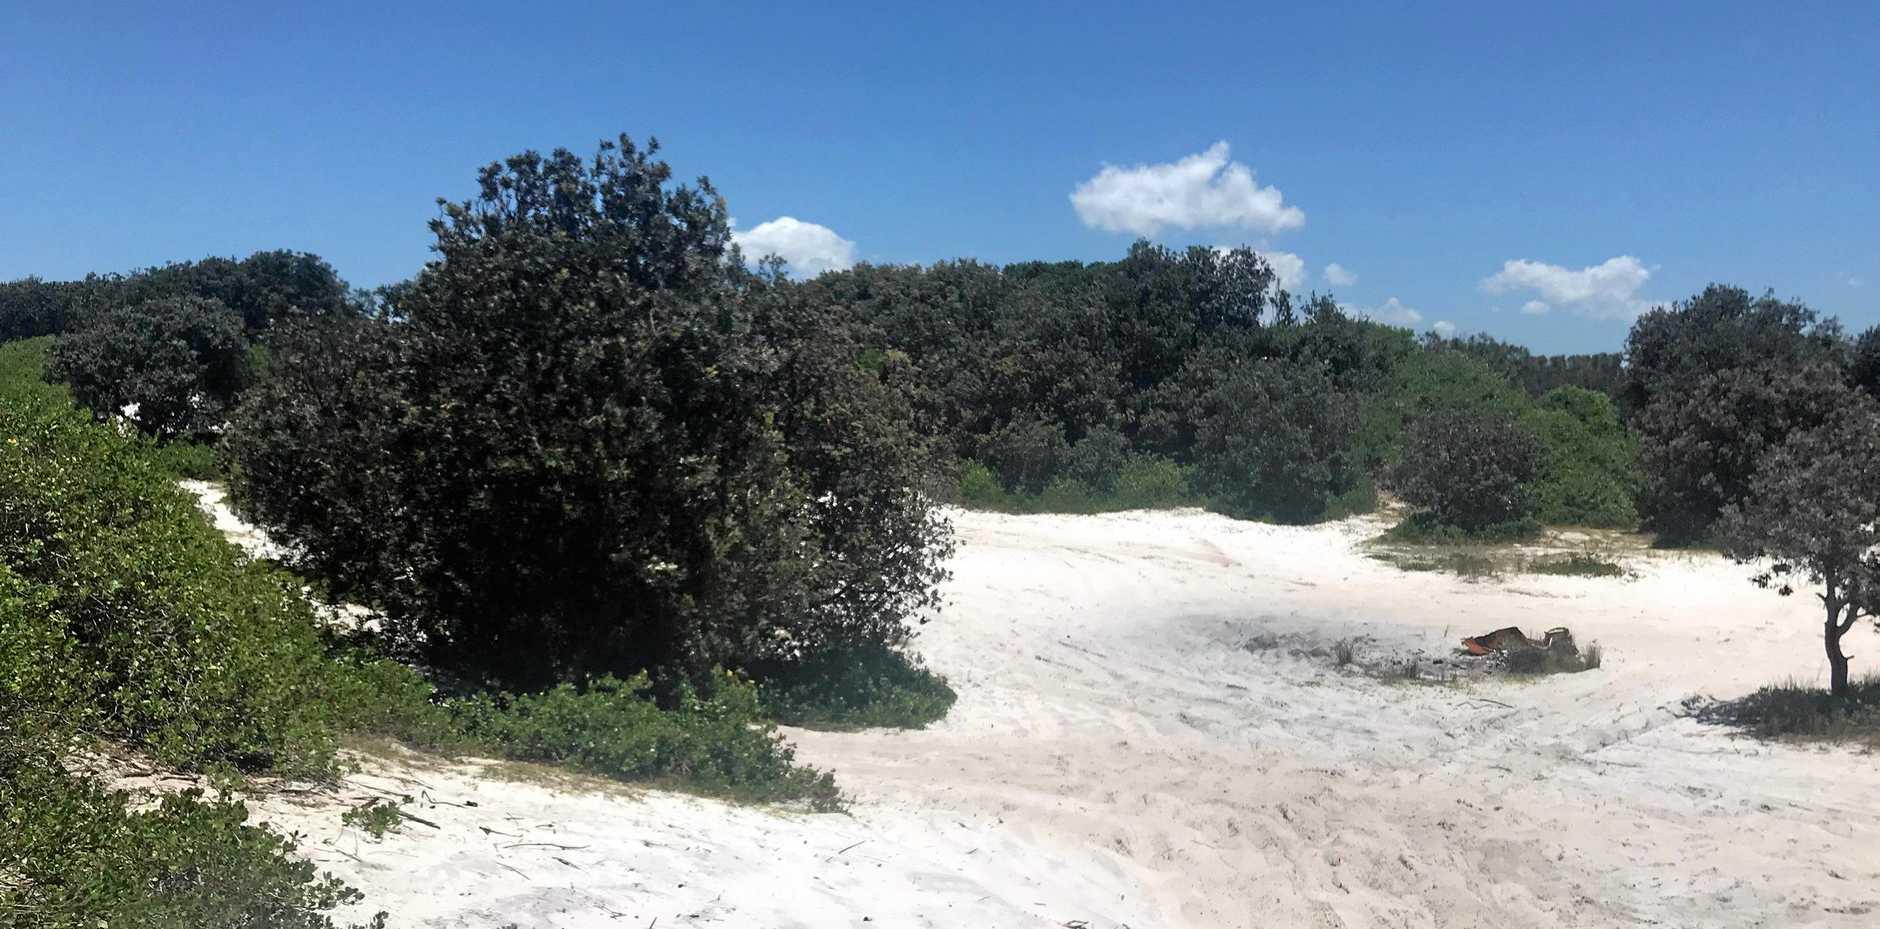 TREASURE IN THE DUNES: According to local legend, there is buried treasure in the dunes at South Ballina.